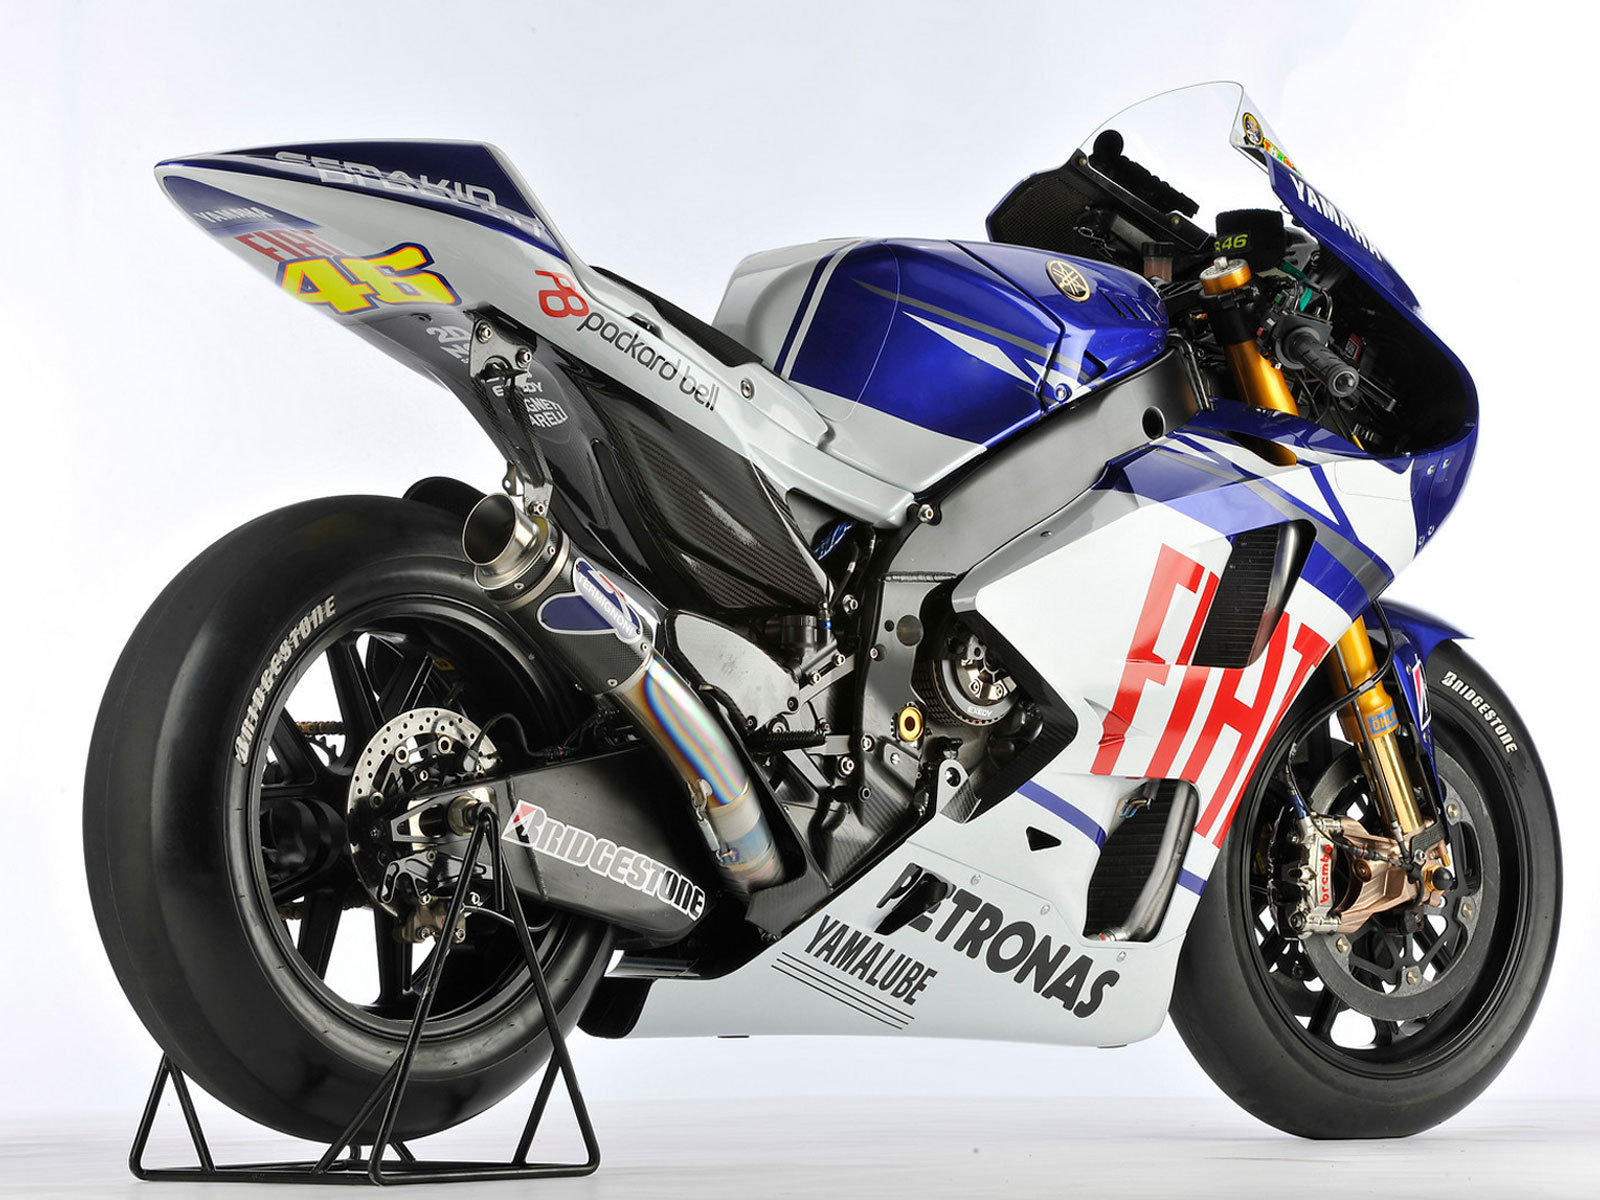 http://3.bp.blogspot.com/-KLJUNIz8qp0/Tl4rI_2U3bI/AAAAAAAAABk/uLXDG9a0nHE/s1600/bike-yzr-m1-motogp-wallpaper-.jpg